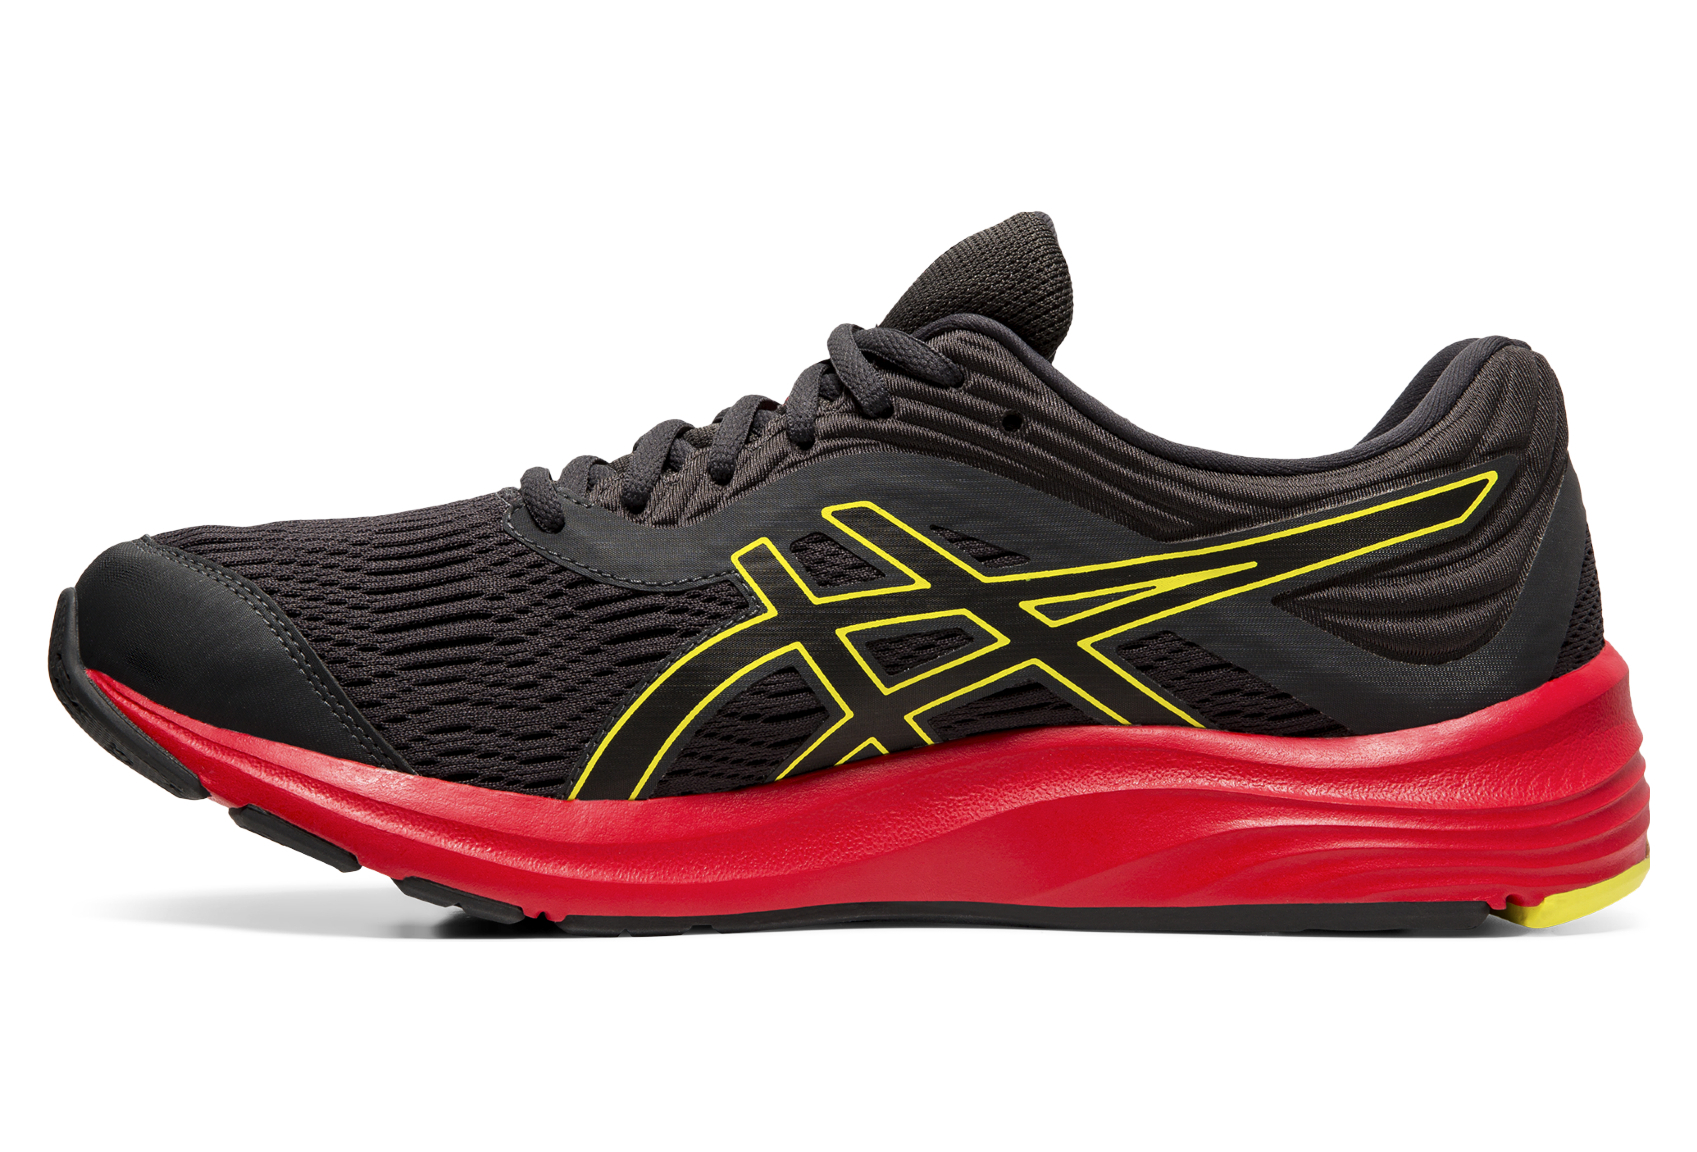 ASICS Gel Pulse 11 GTX Running Shoes